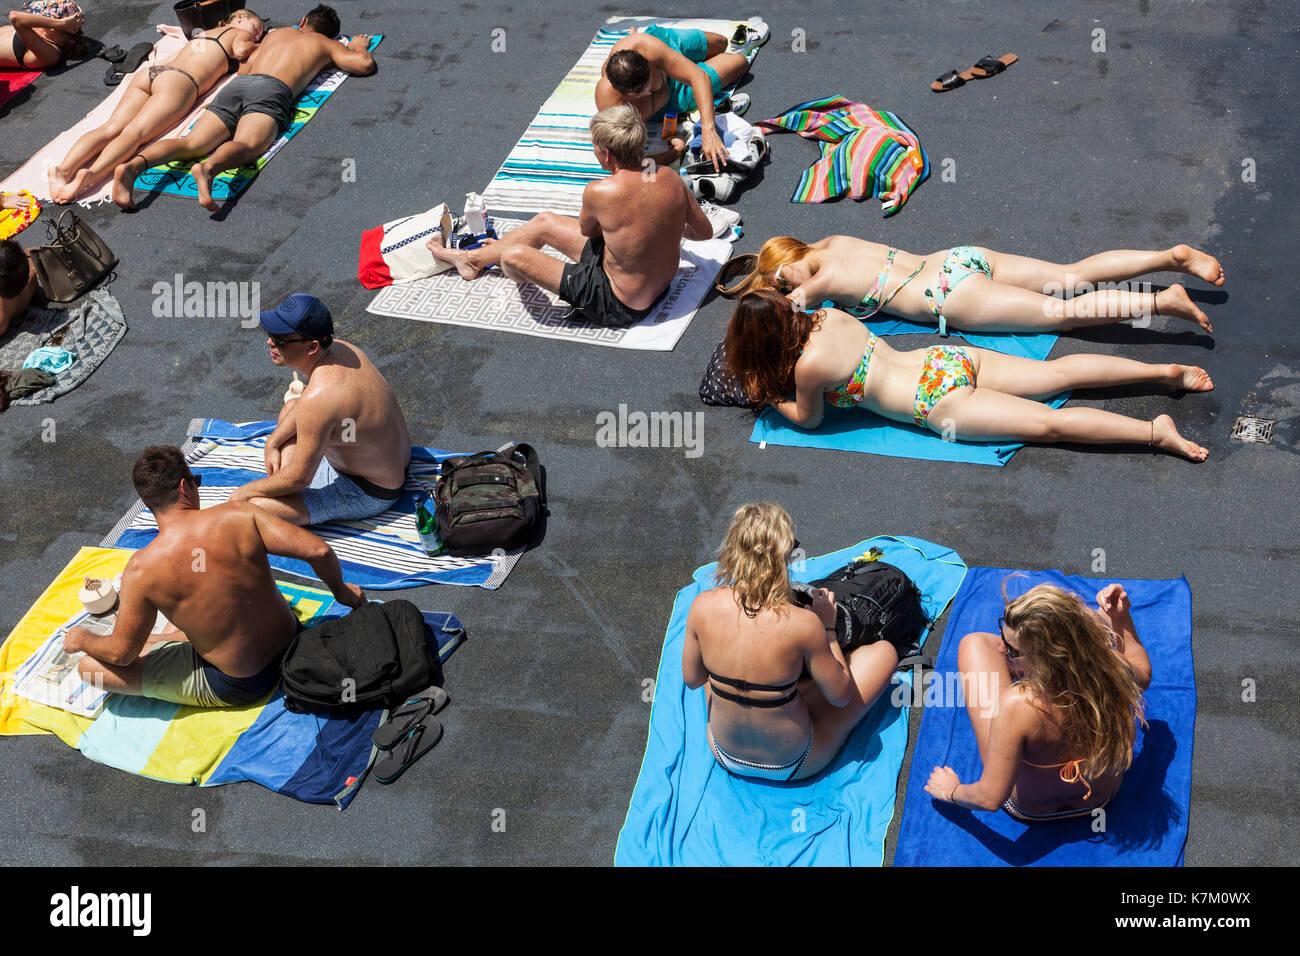 sunbathers in Sydney, NSW, Australia - Stock Image